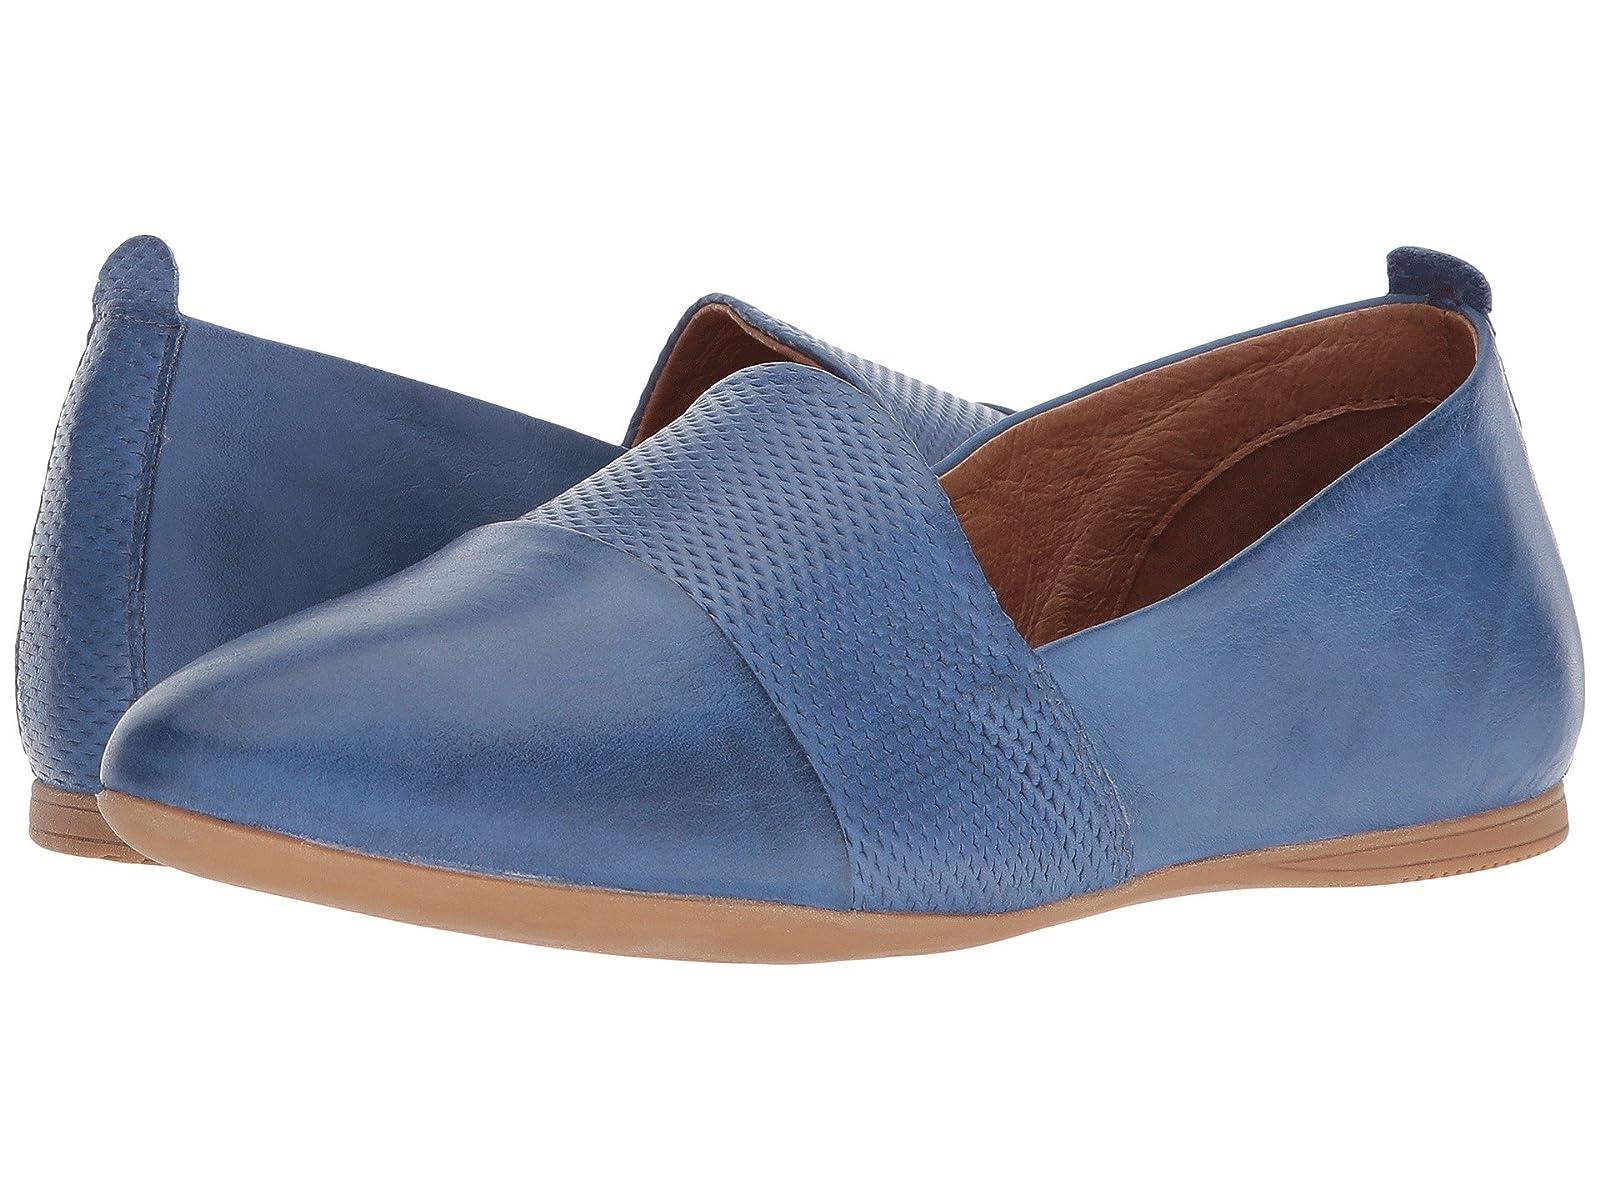 Miz Mooz KaileyCheap and distinctive eye-catching shoes